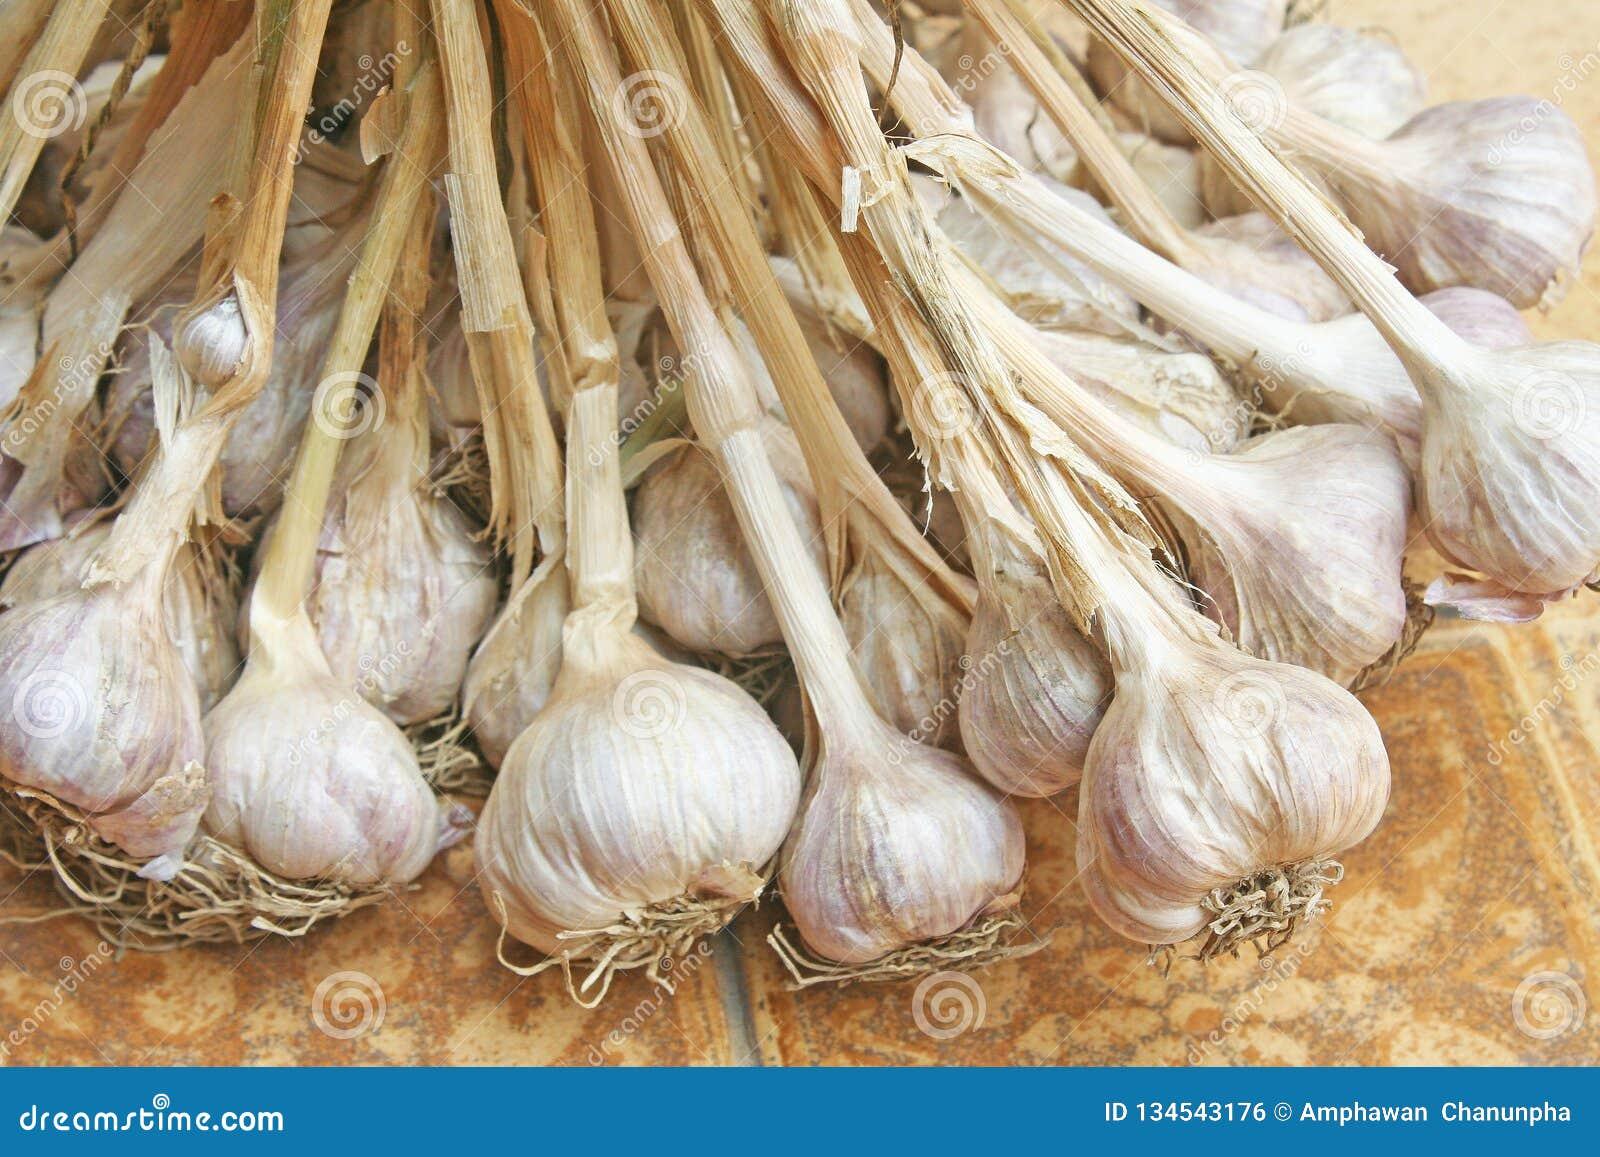 Garlic plant groups